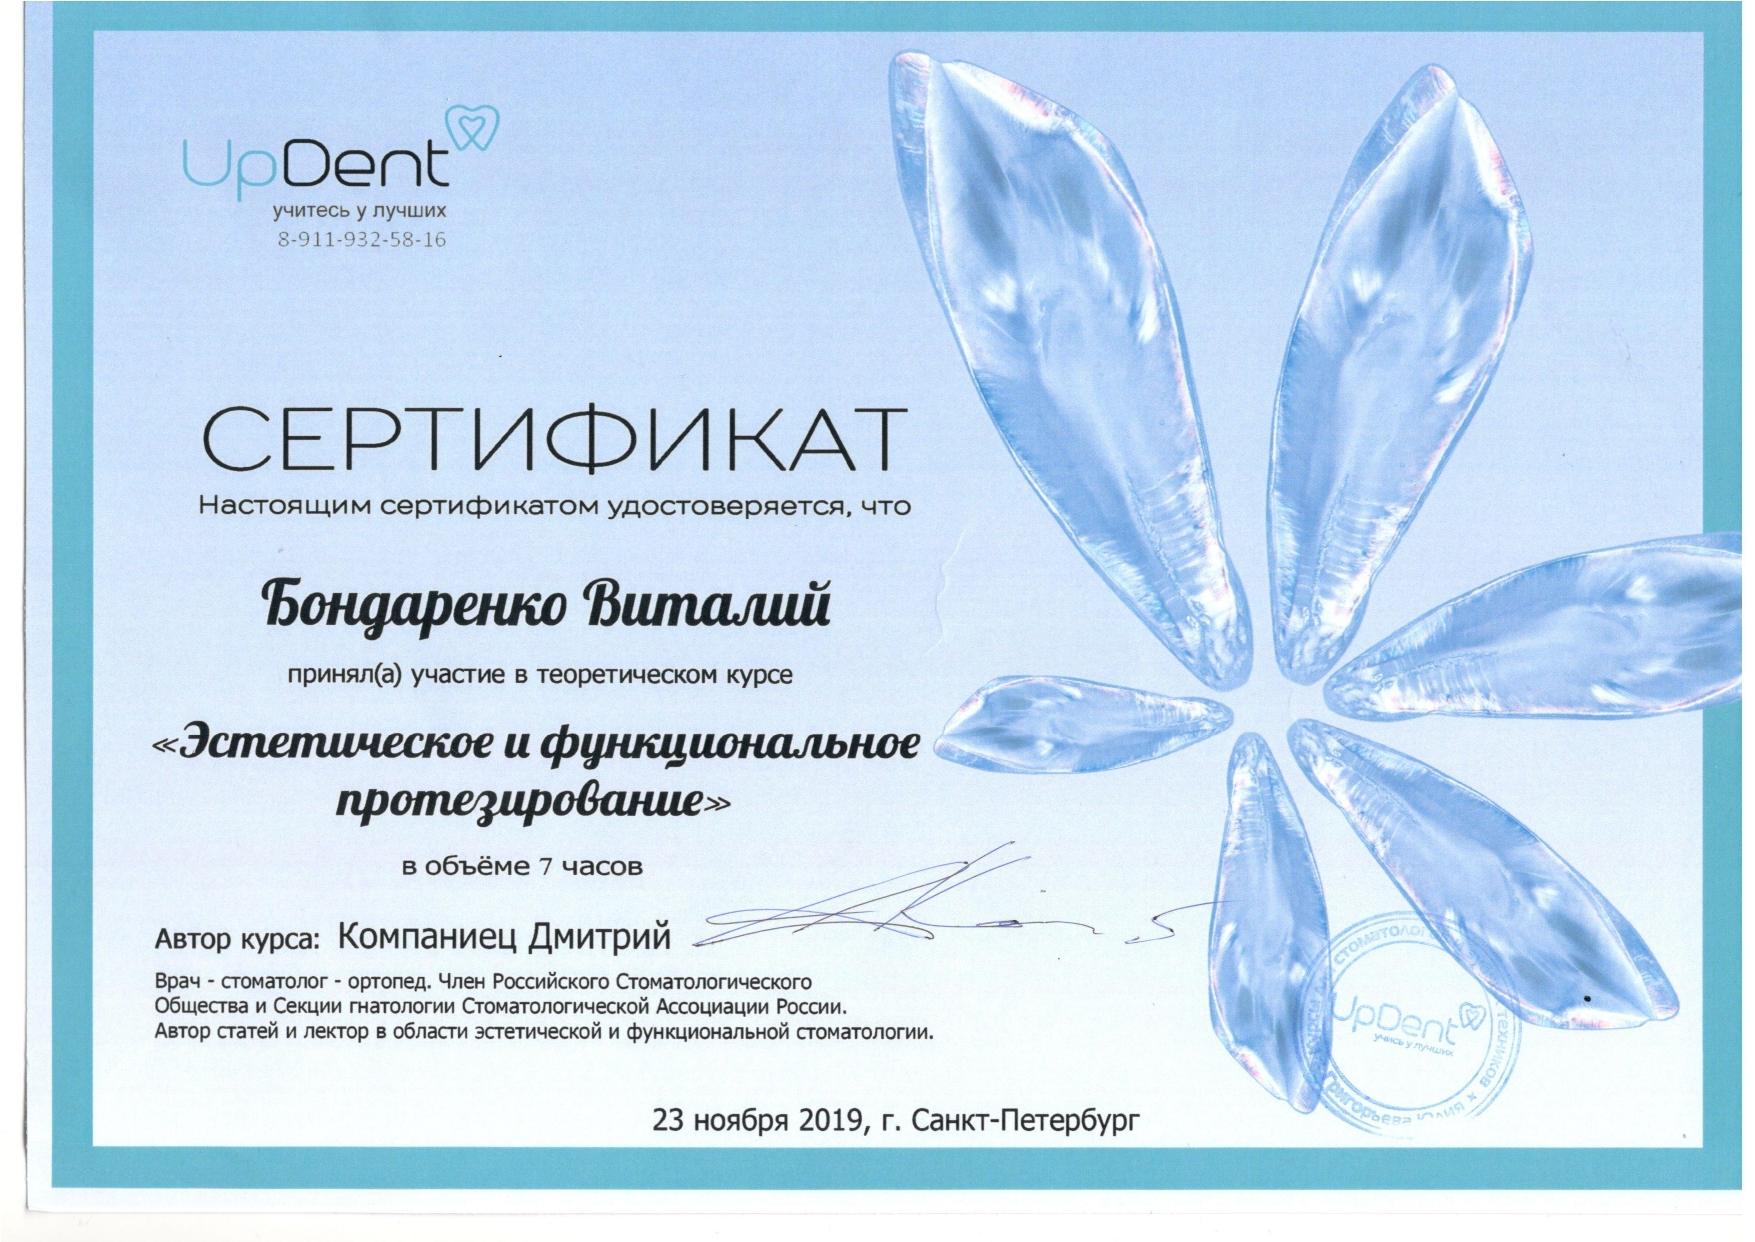 Сертификат-Бондаренко Виталий Иванович